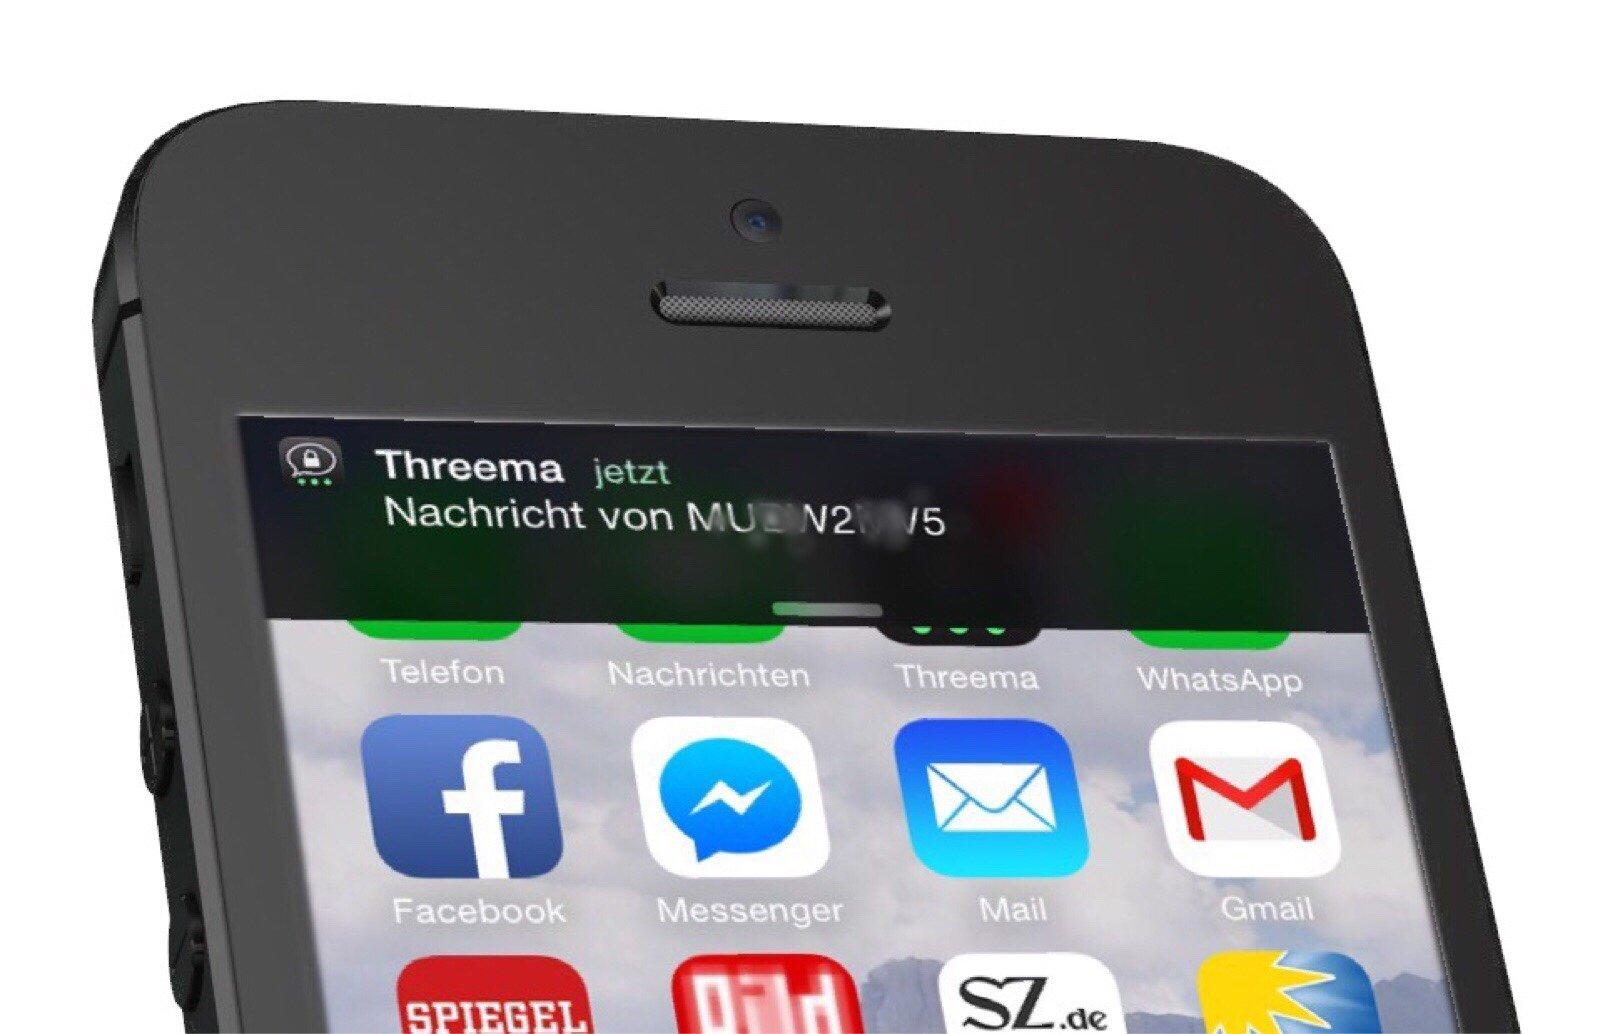 iPhone-App-Threema-Absender-Name-Benutzer-1.jpg